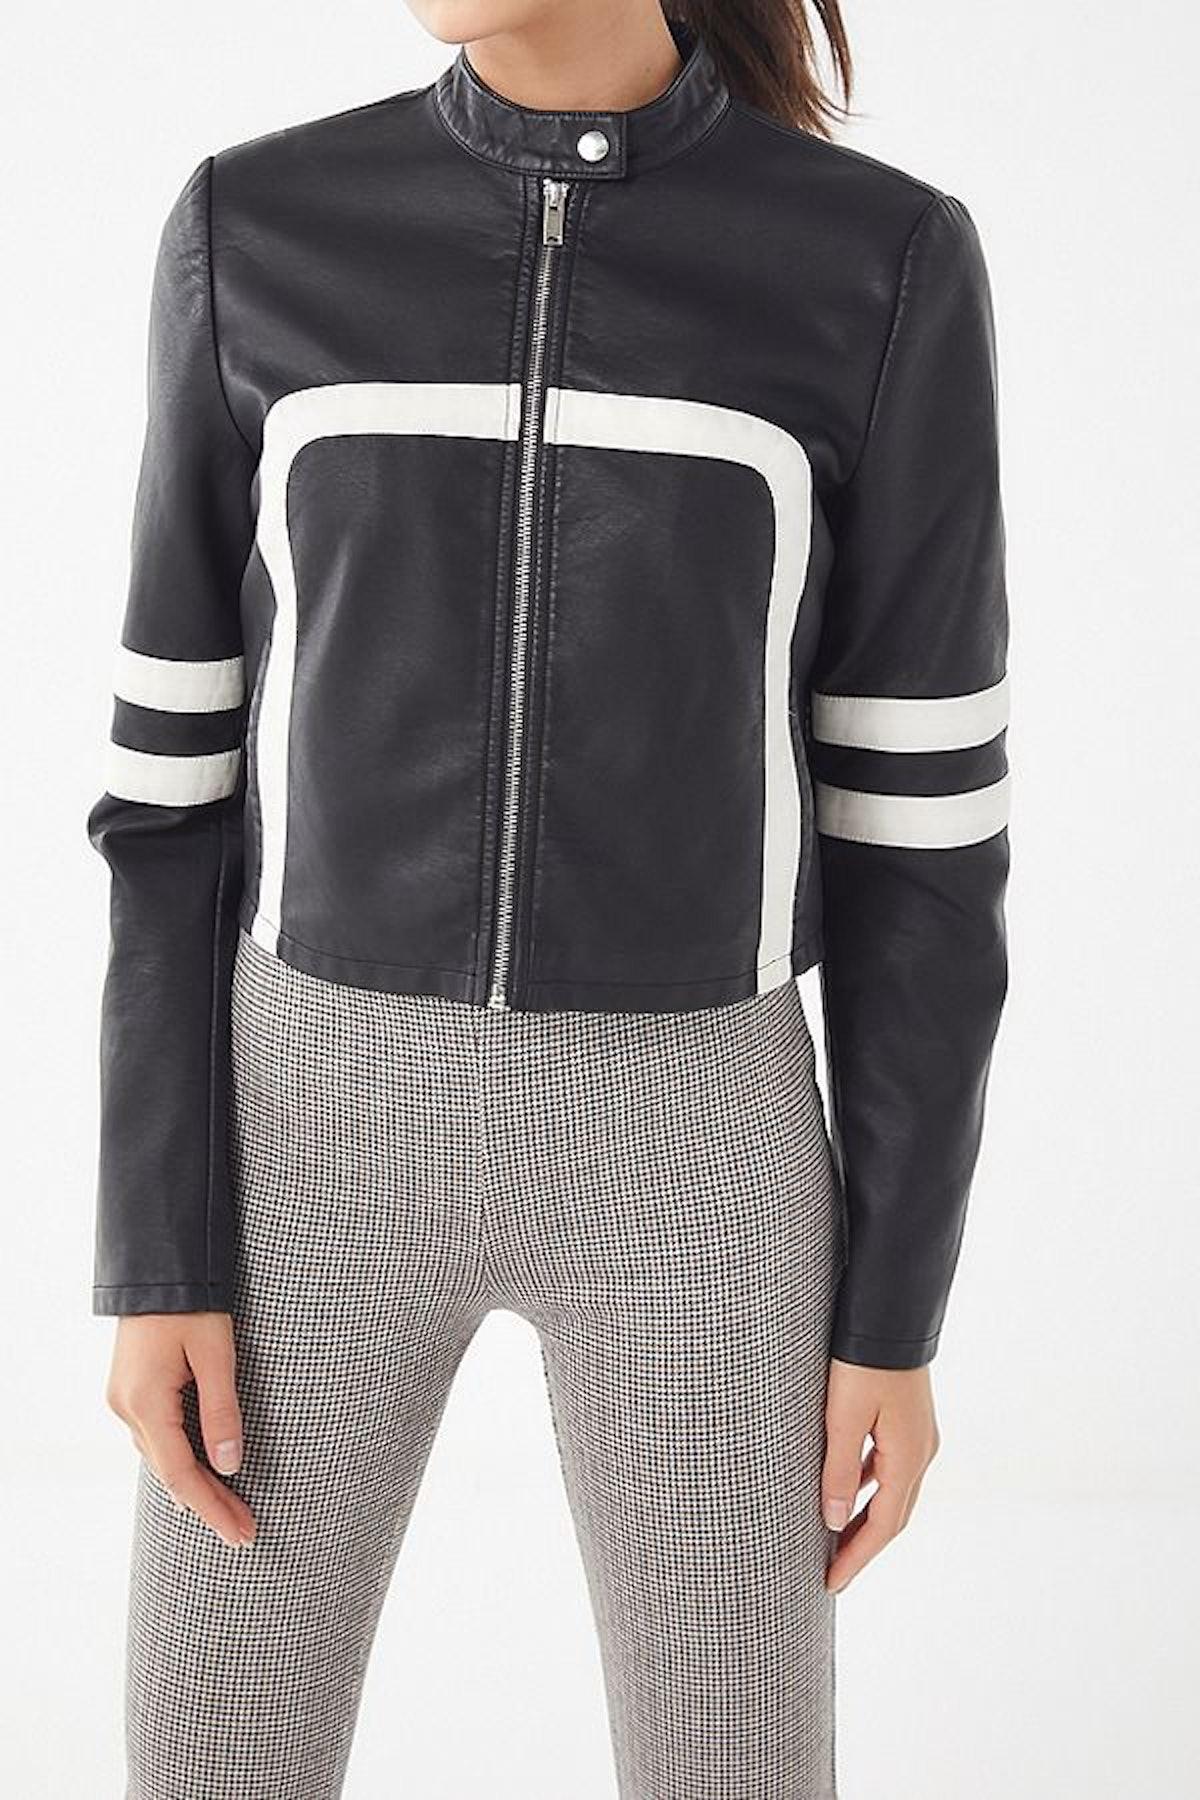 UO Faux Leather Colorblock Moto Jacket